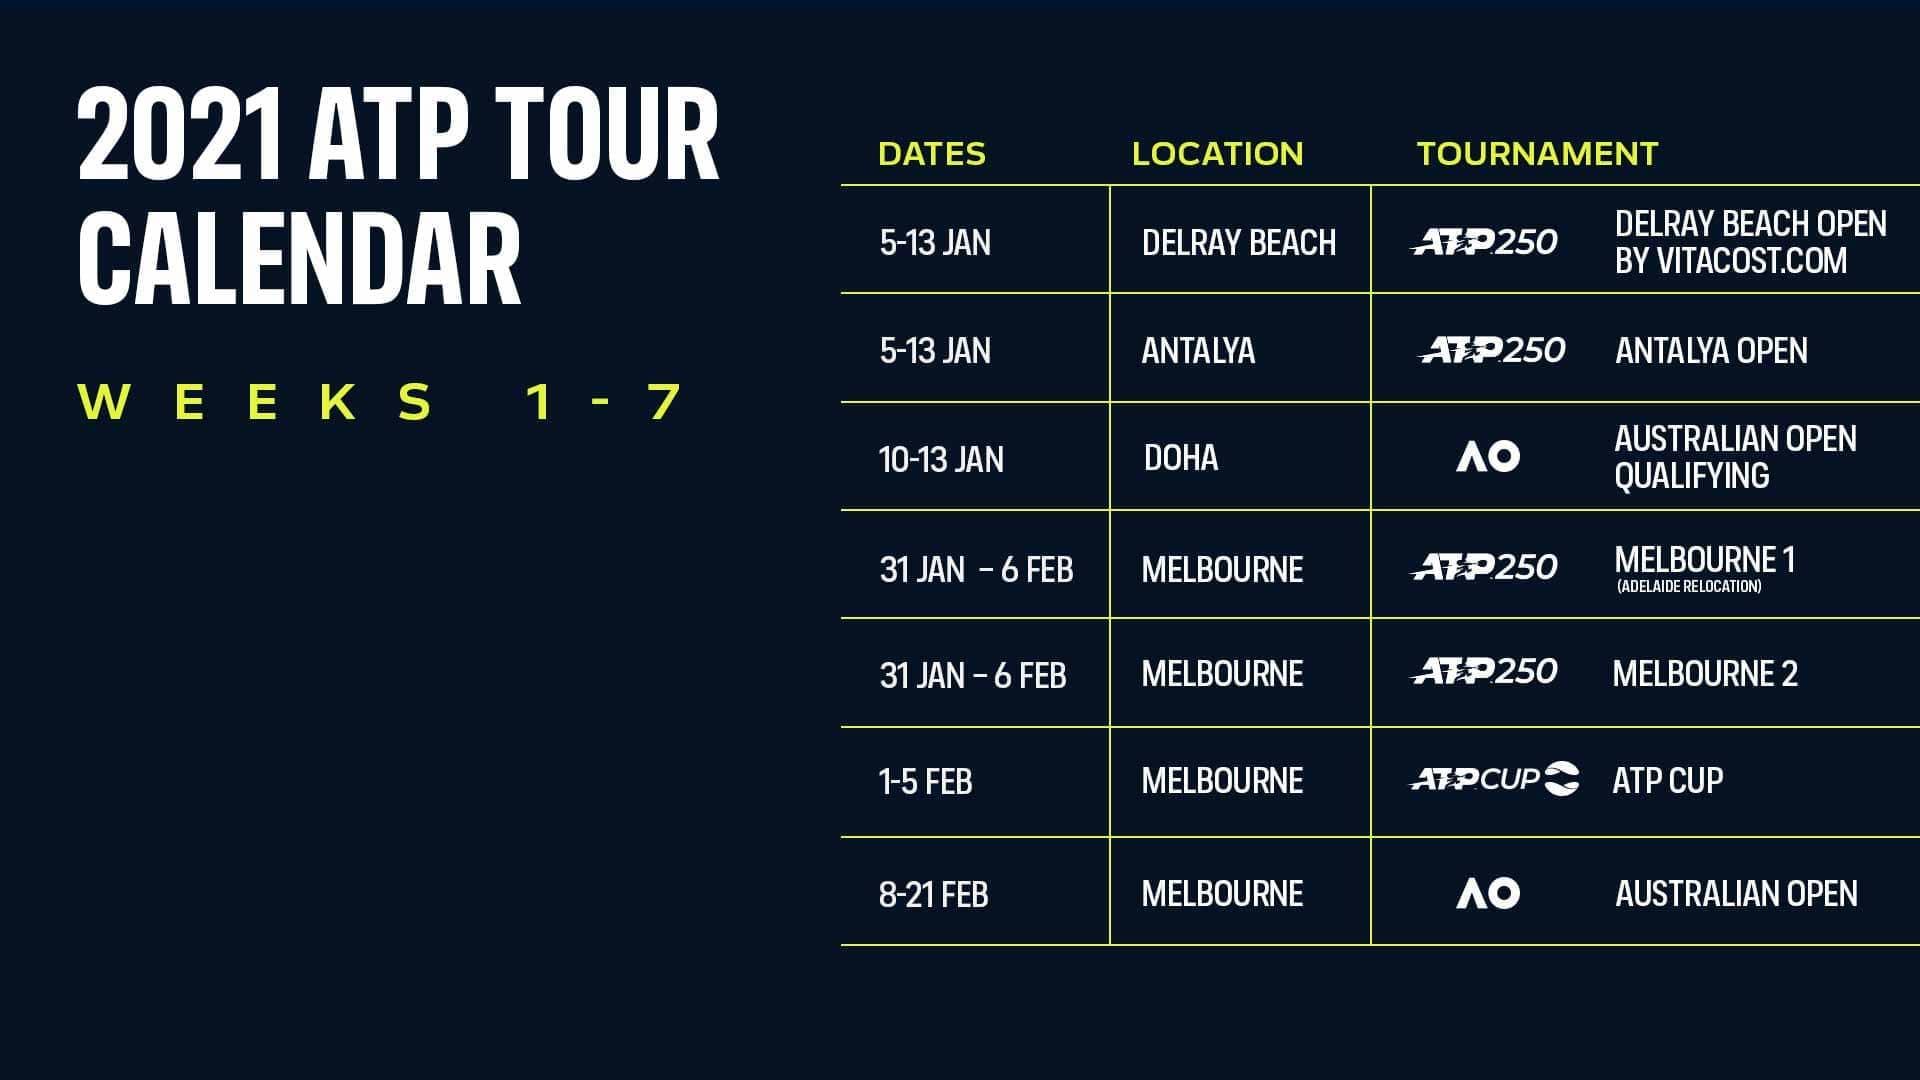 Calendario 2021 Atp ATP Announces Updated Start To 2021 Calendar | ATP Tour | Tennis